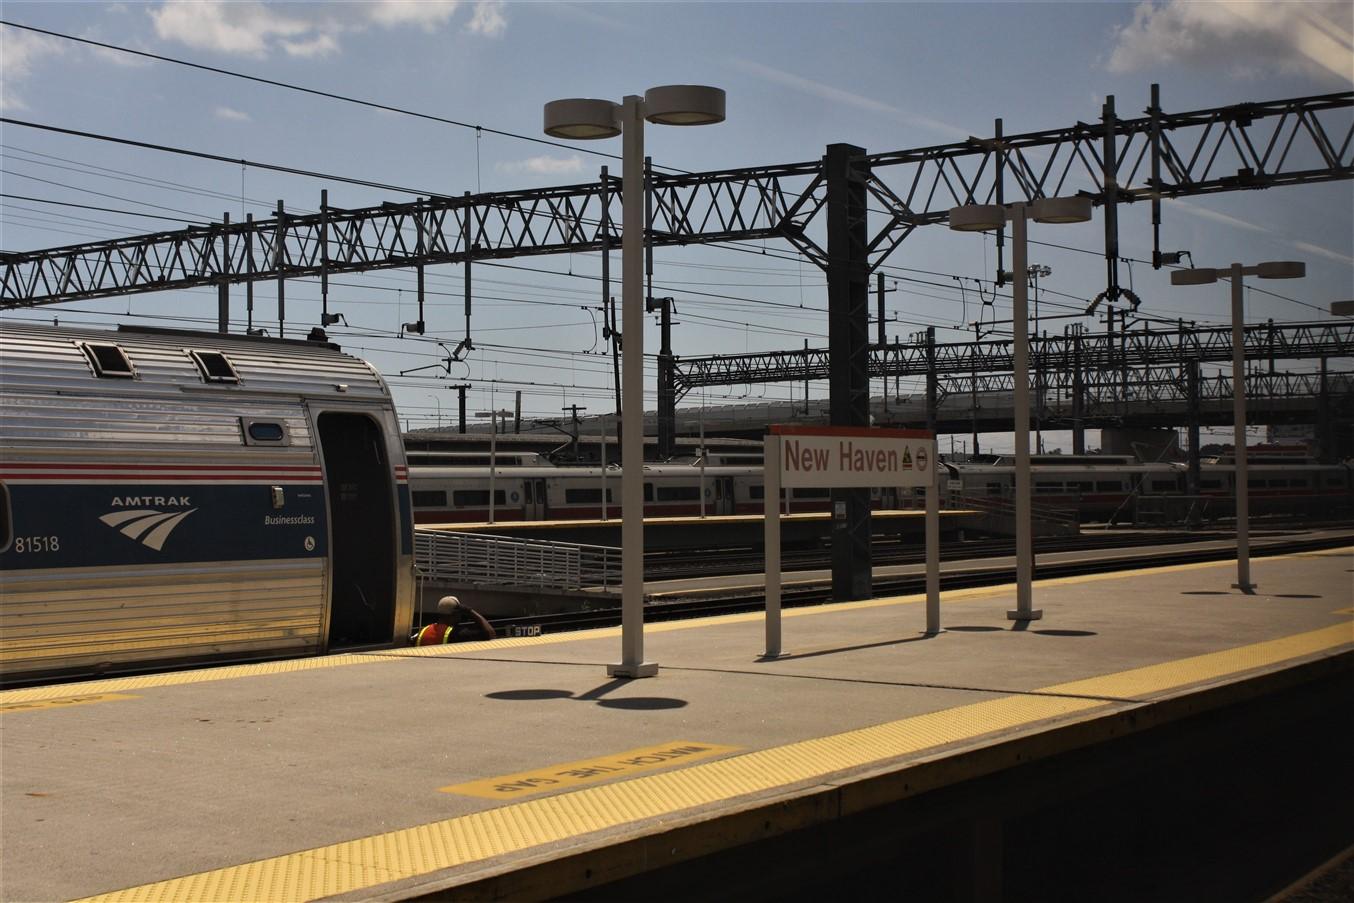 2010 07 11 Acela Train to NYC  15.jpg